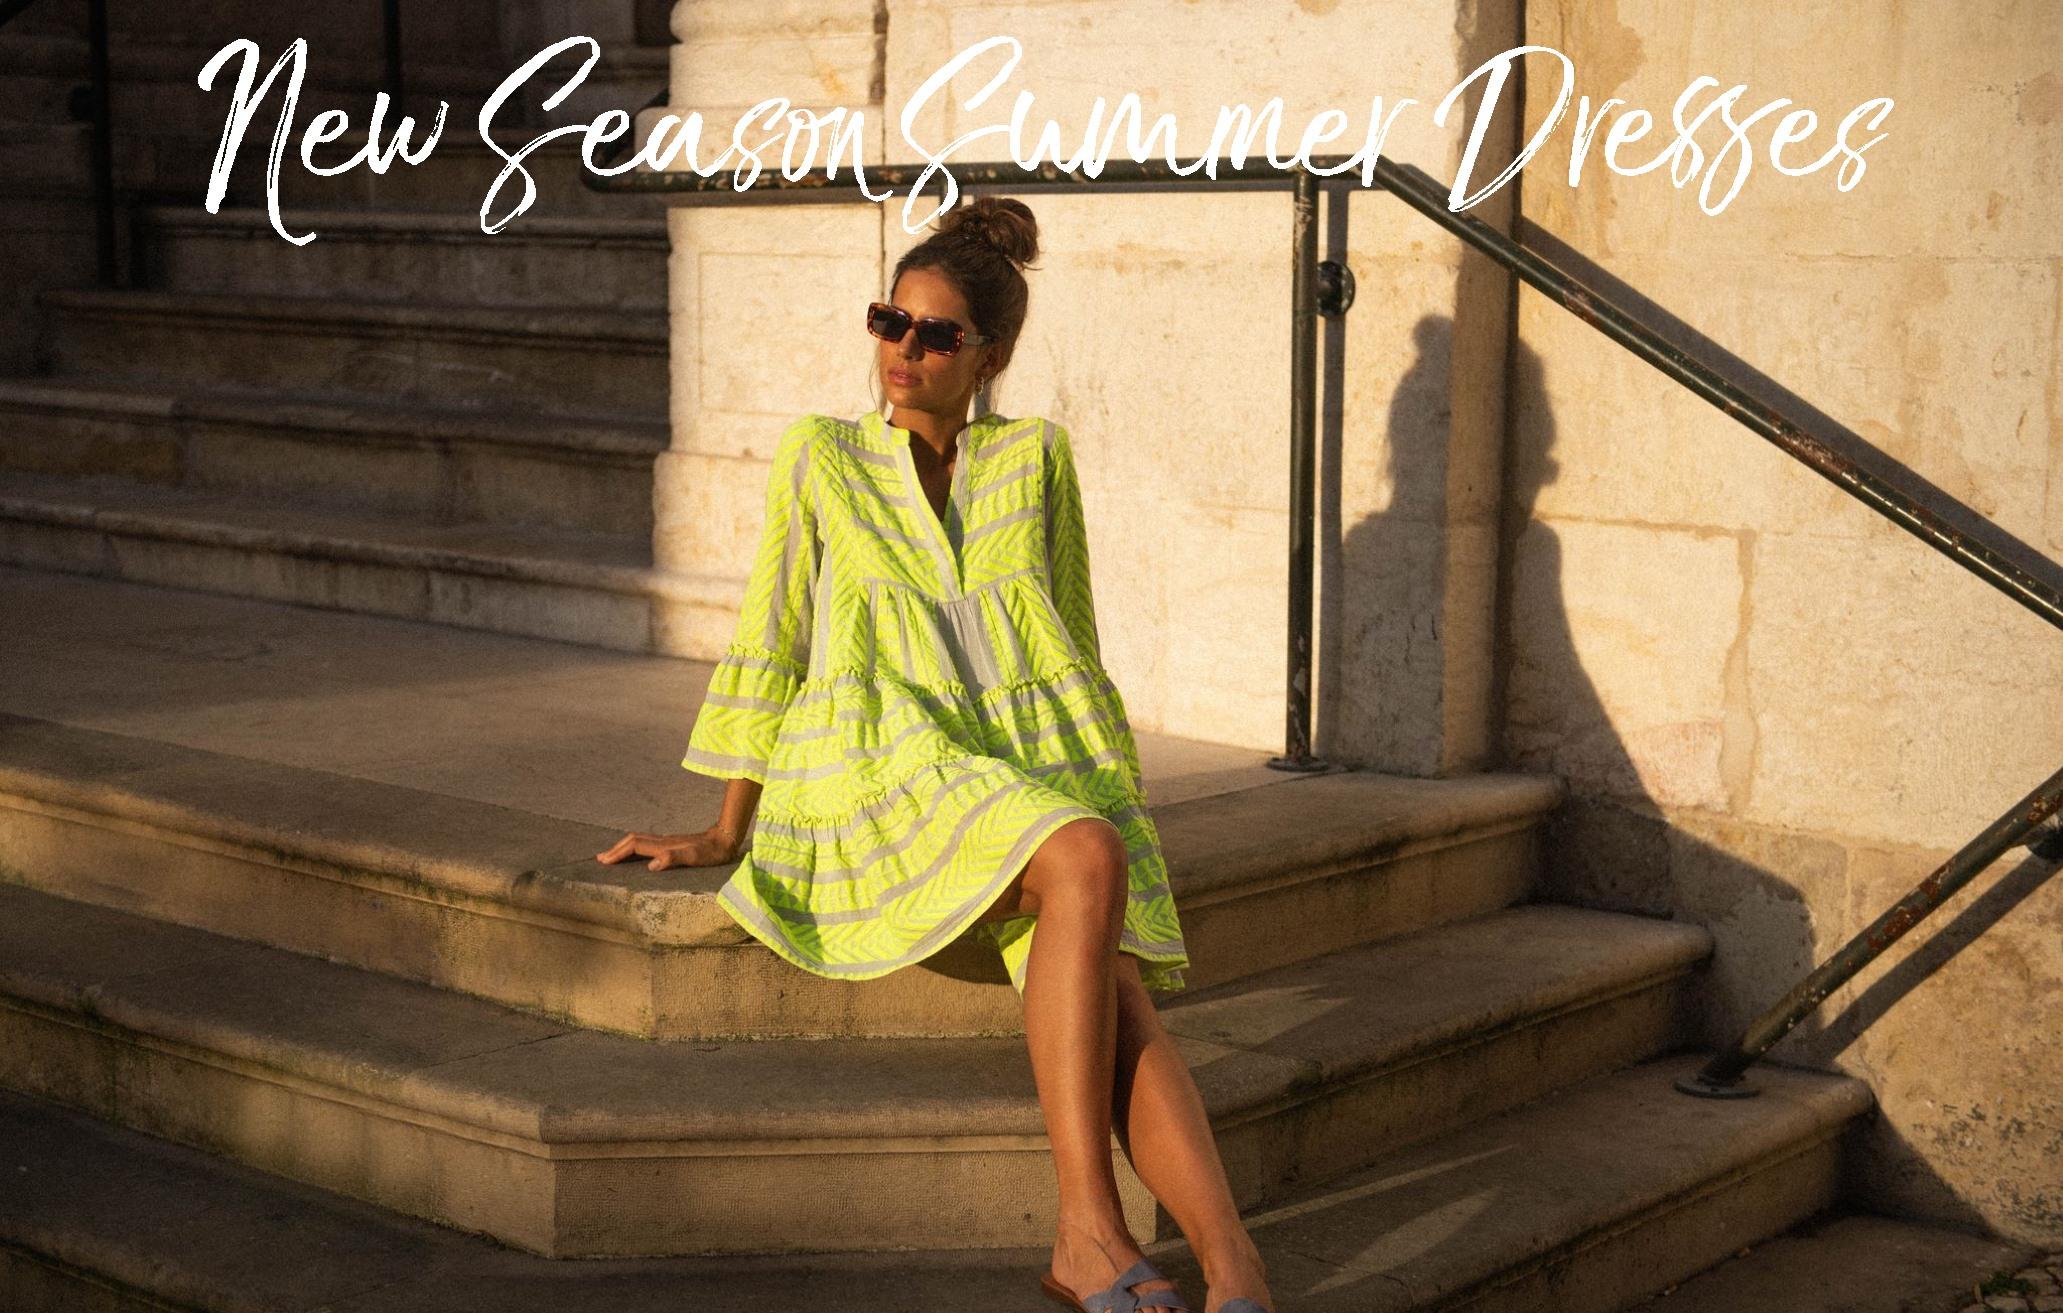 New Season Summer Dresses